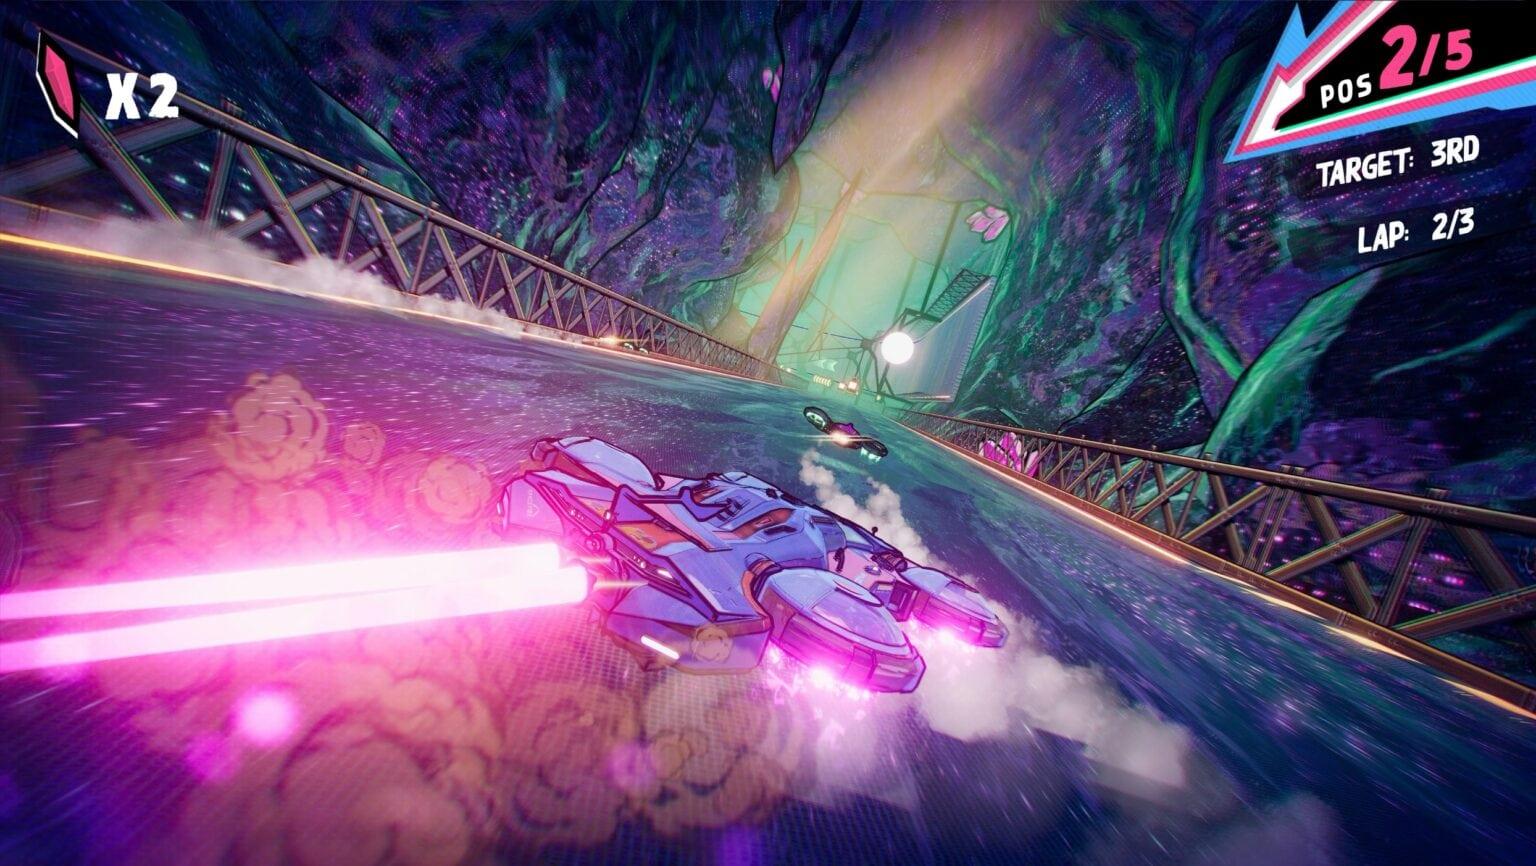 ' Warp Drive - Teleport Racing' debuted November 27 on Apple Arcade.